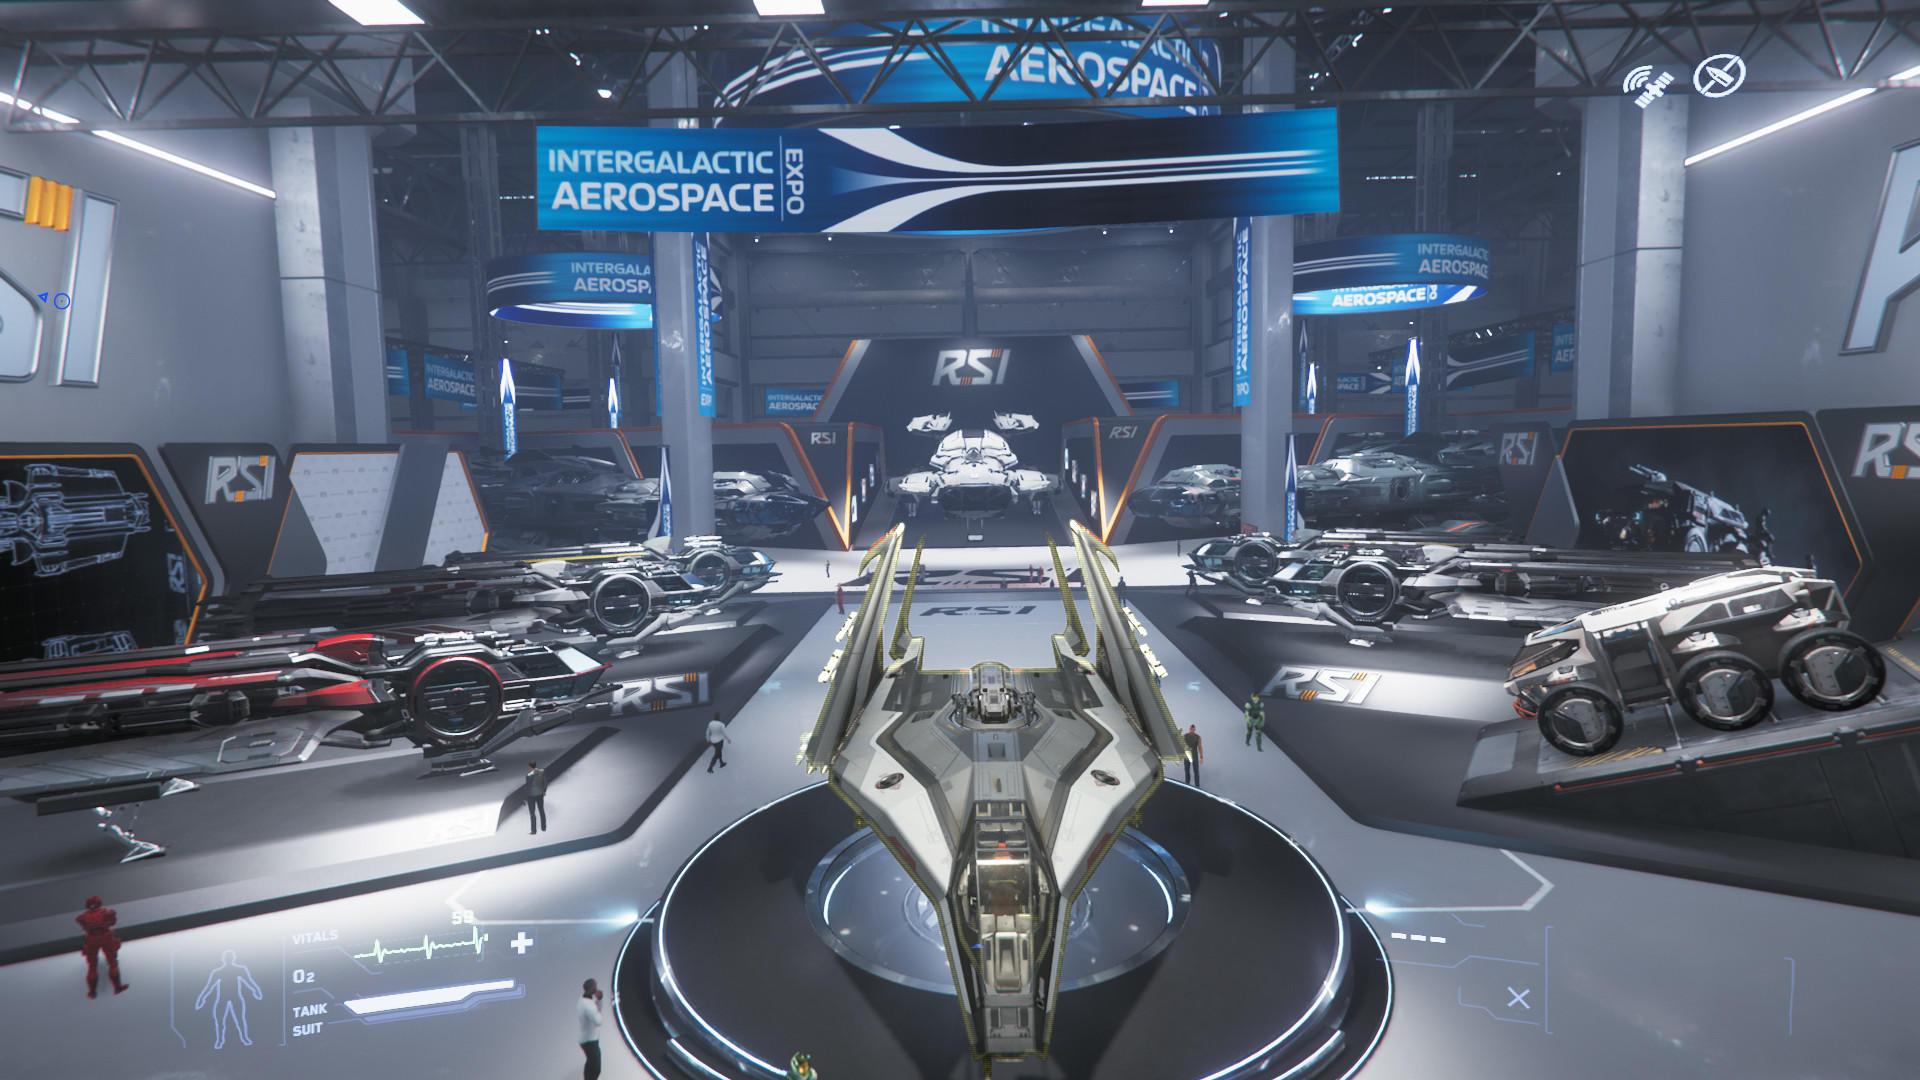 Intergalactic Aerospace Expo 2948